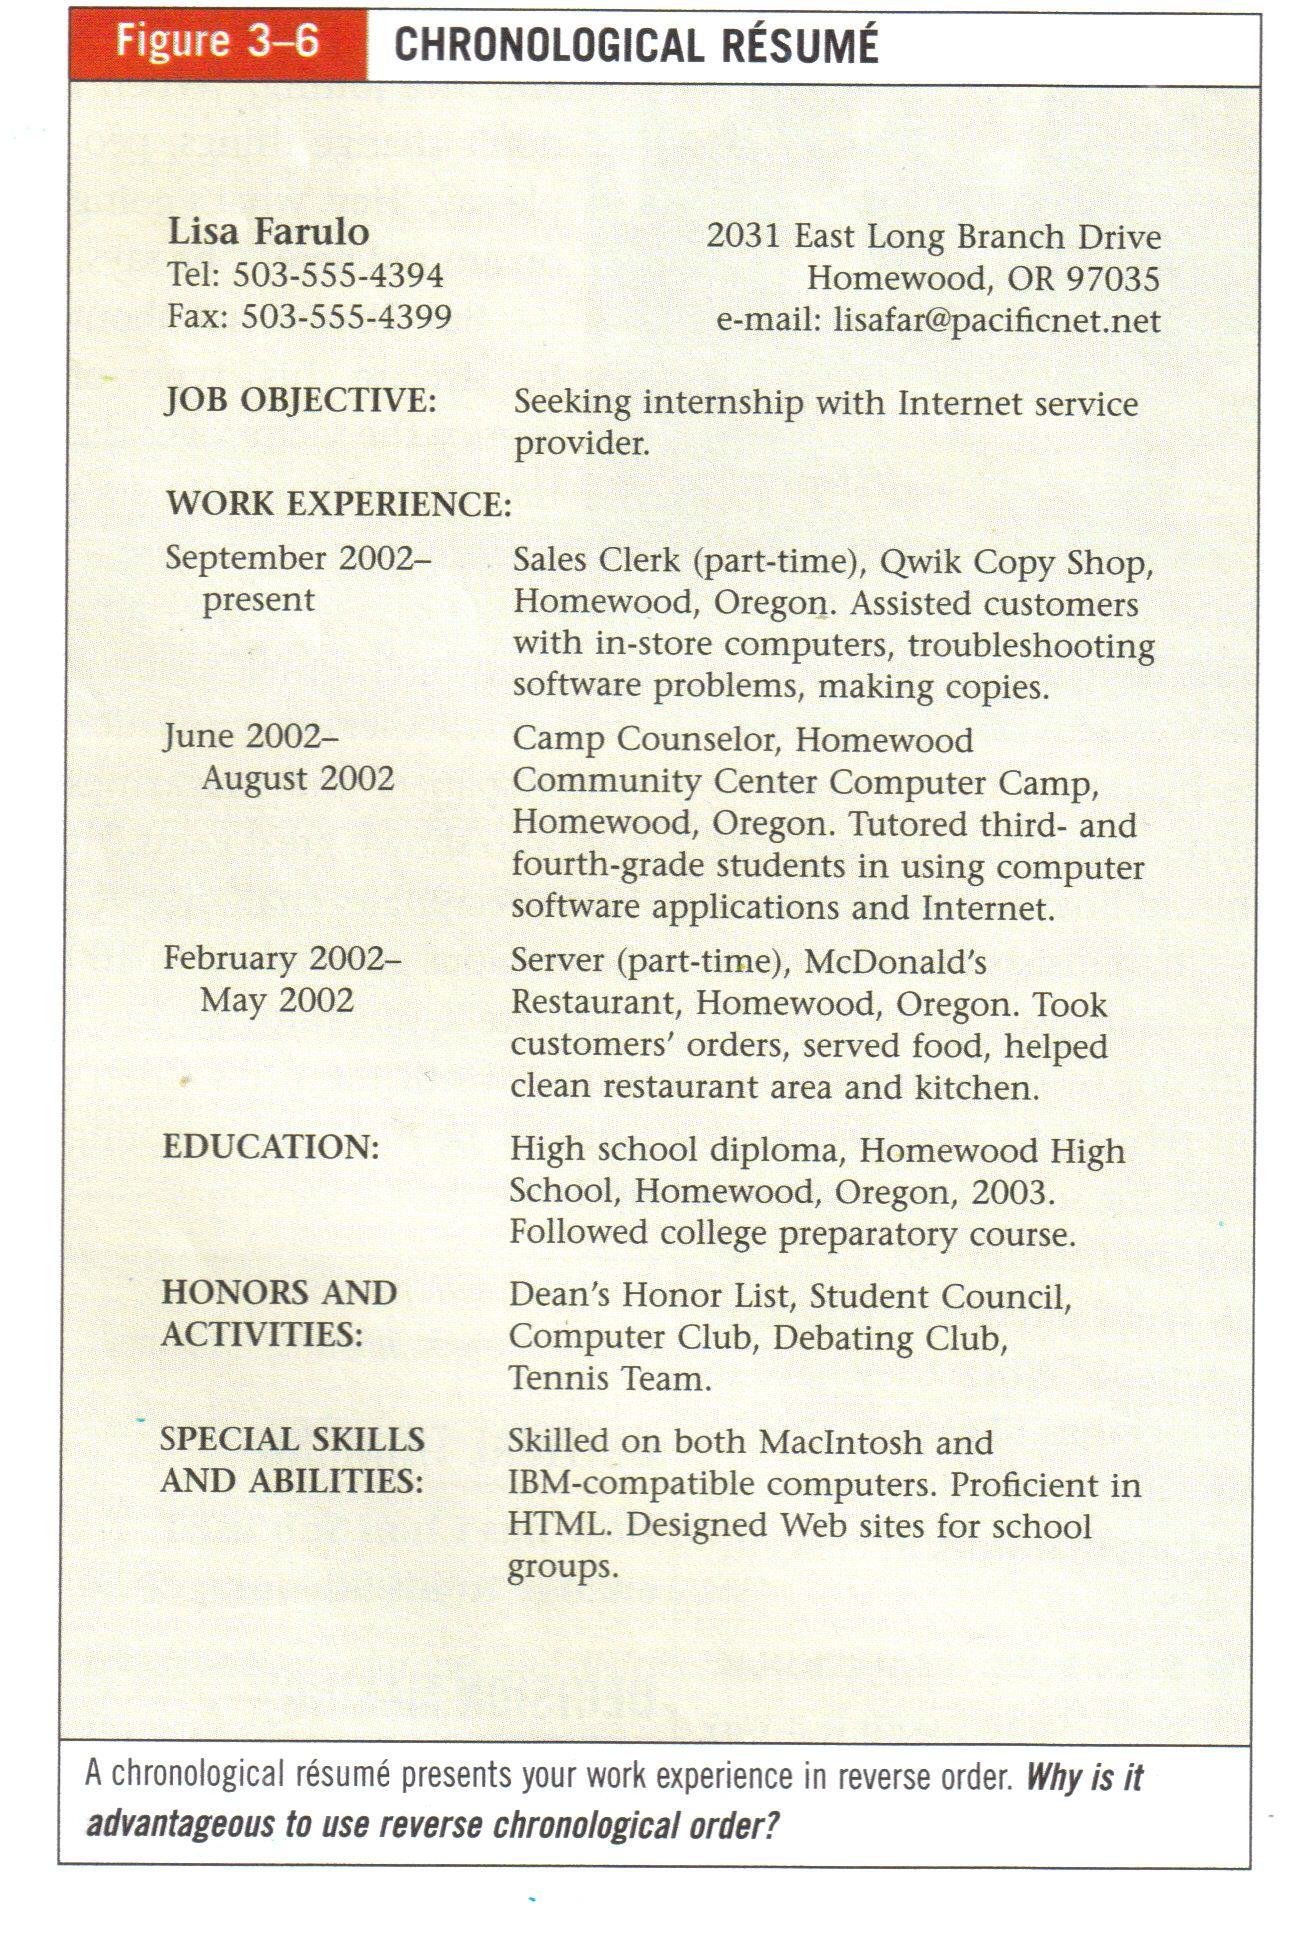 Sample Chronological Resume Chronological Resume Chronological Resume Template Downloadable Resume Template